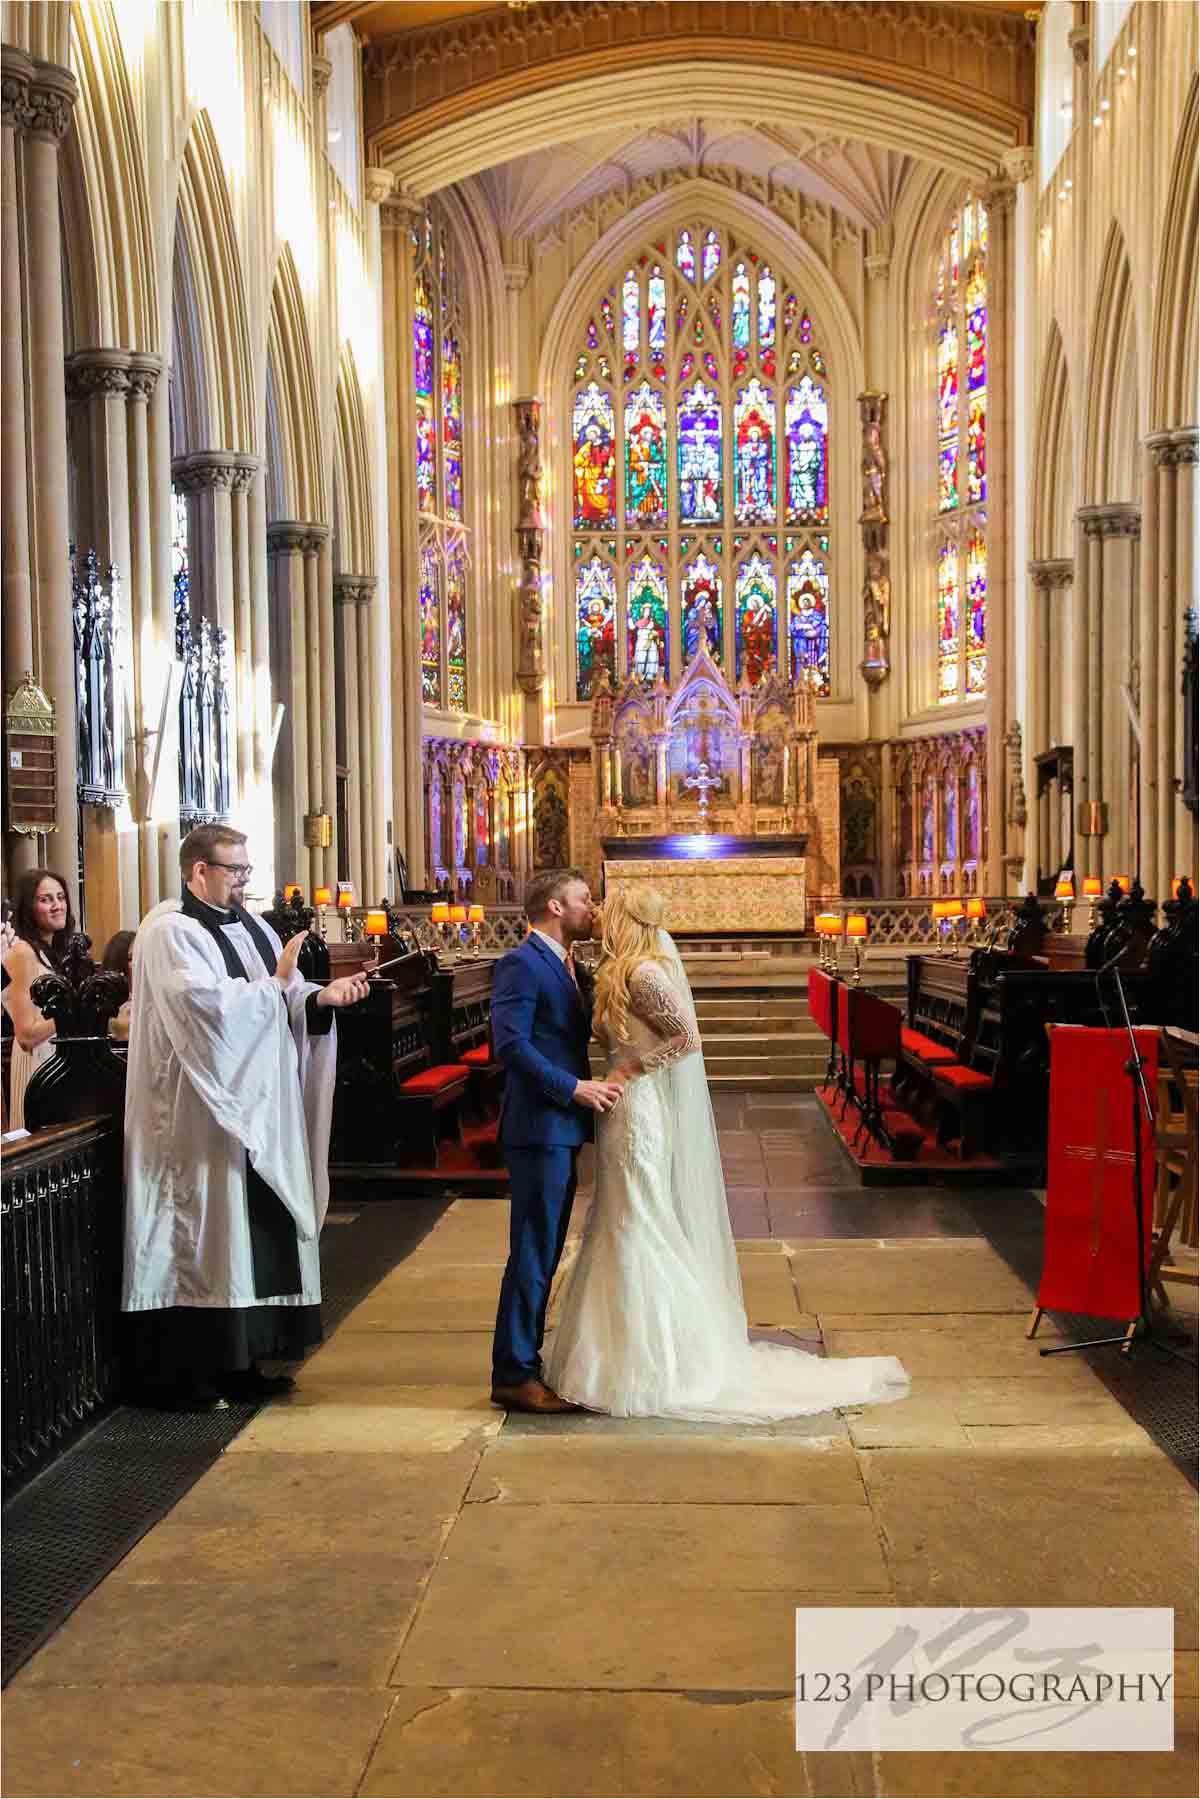 Leeds Minster wedding photographer